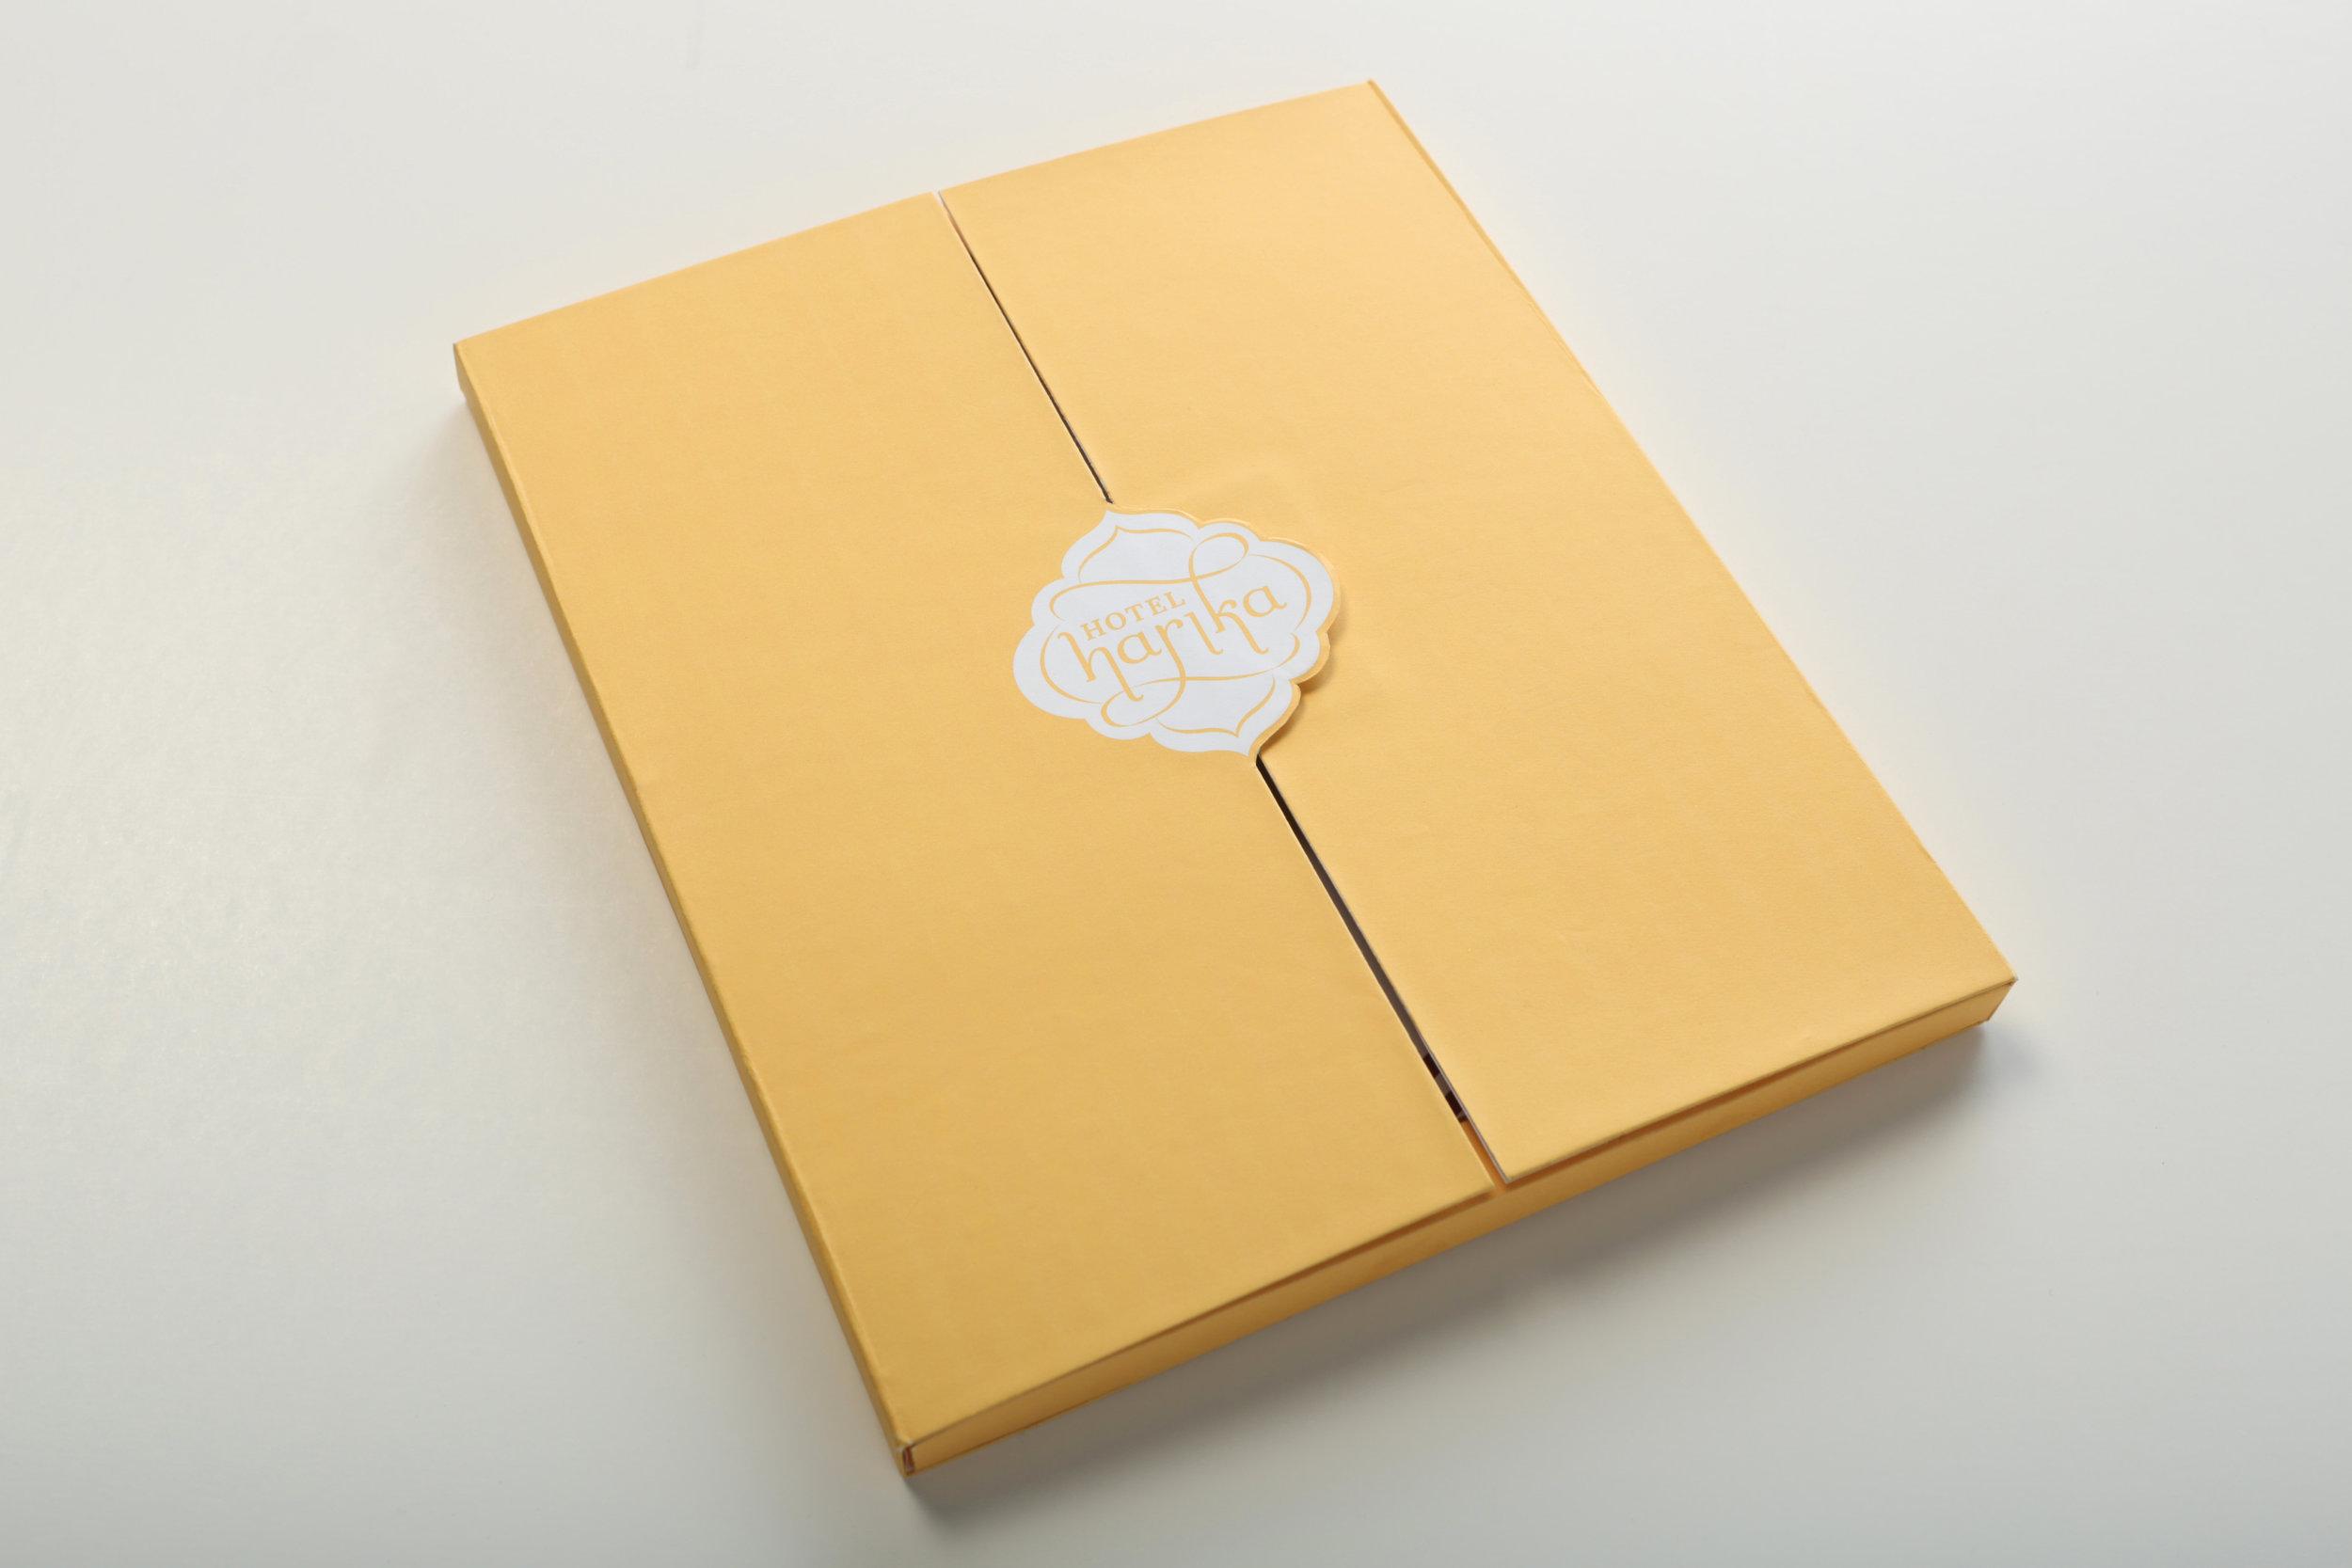 harika_stationery box.jpg